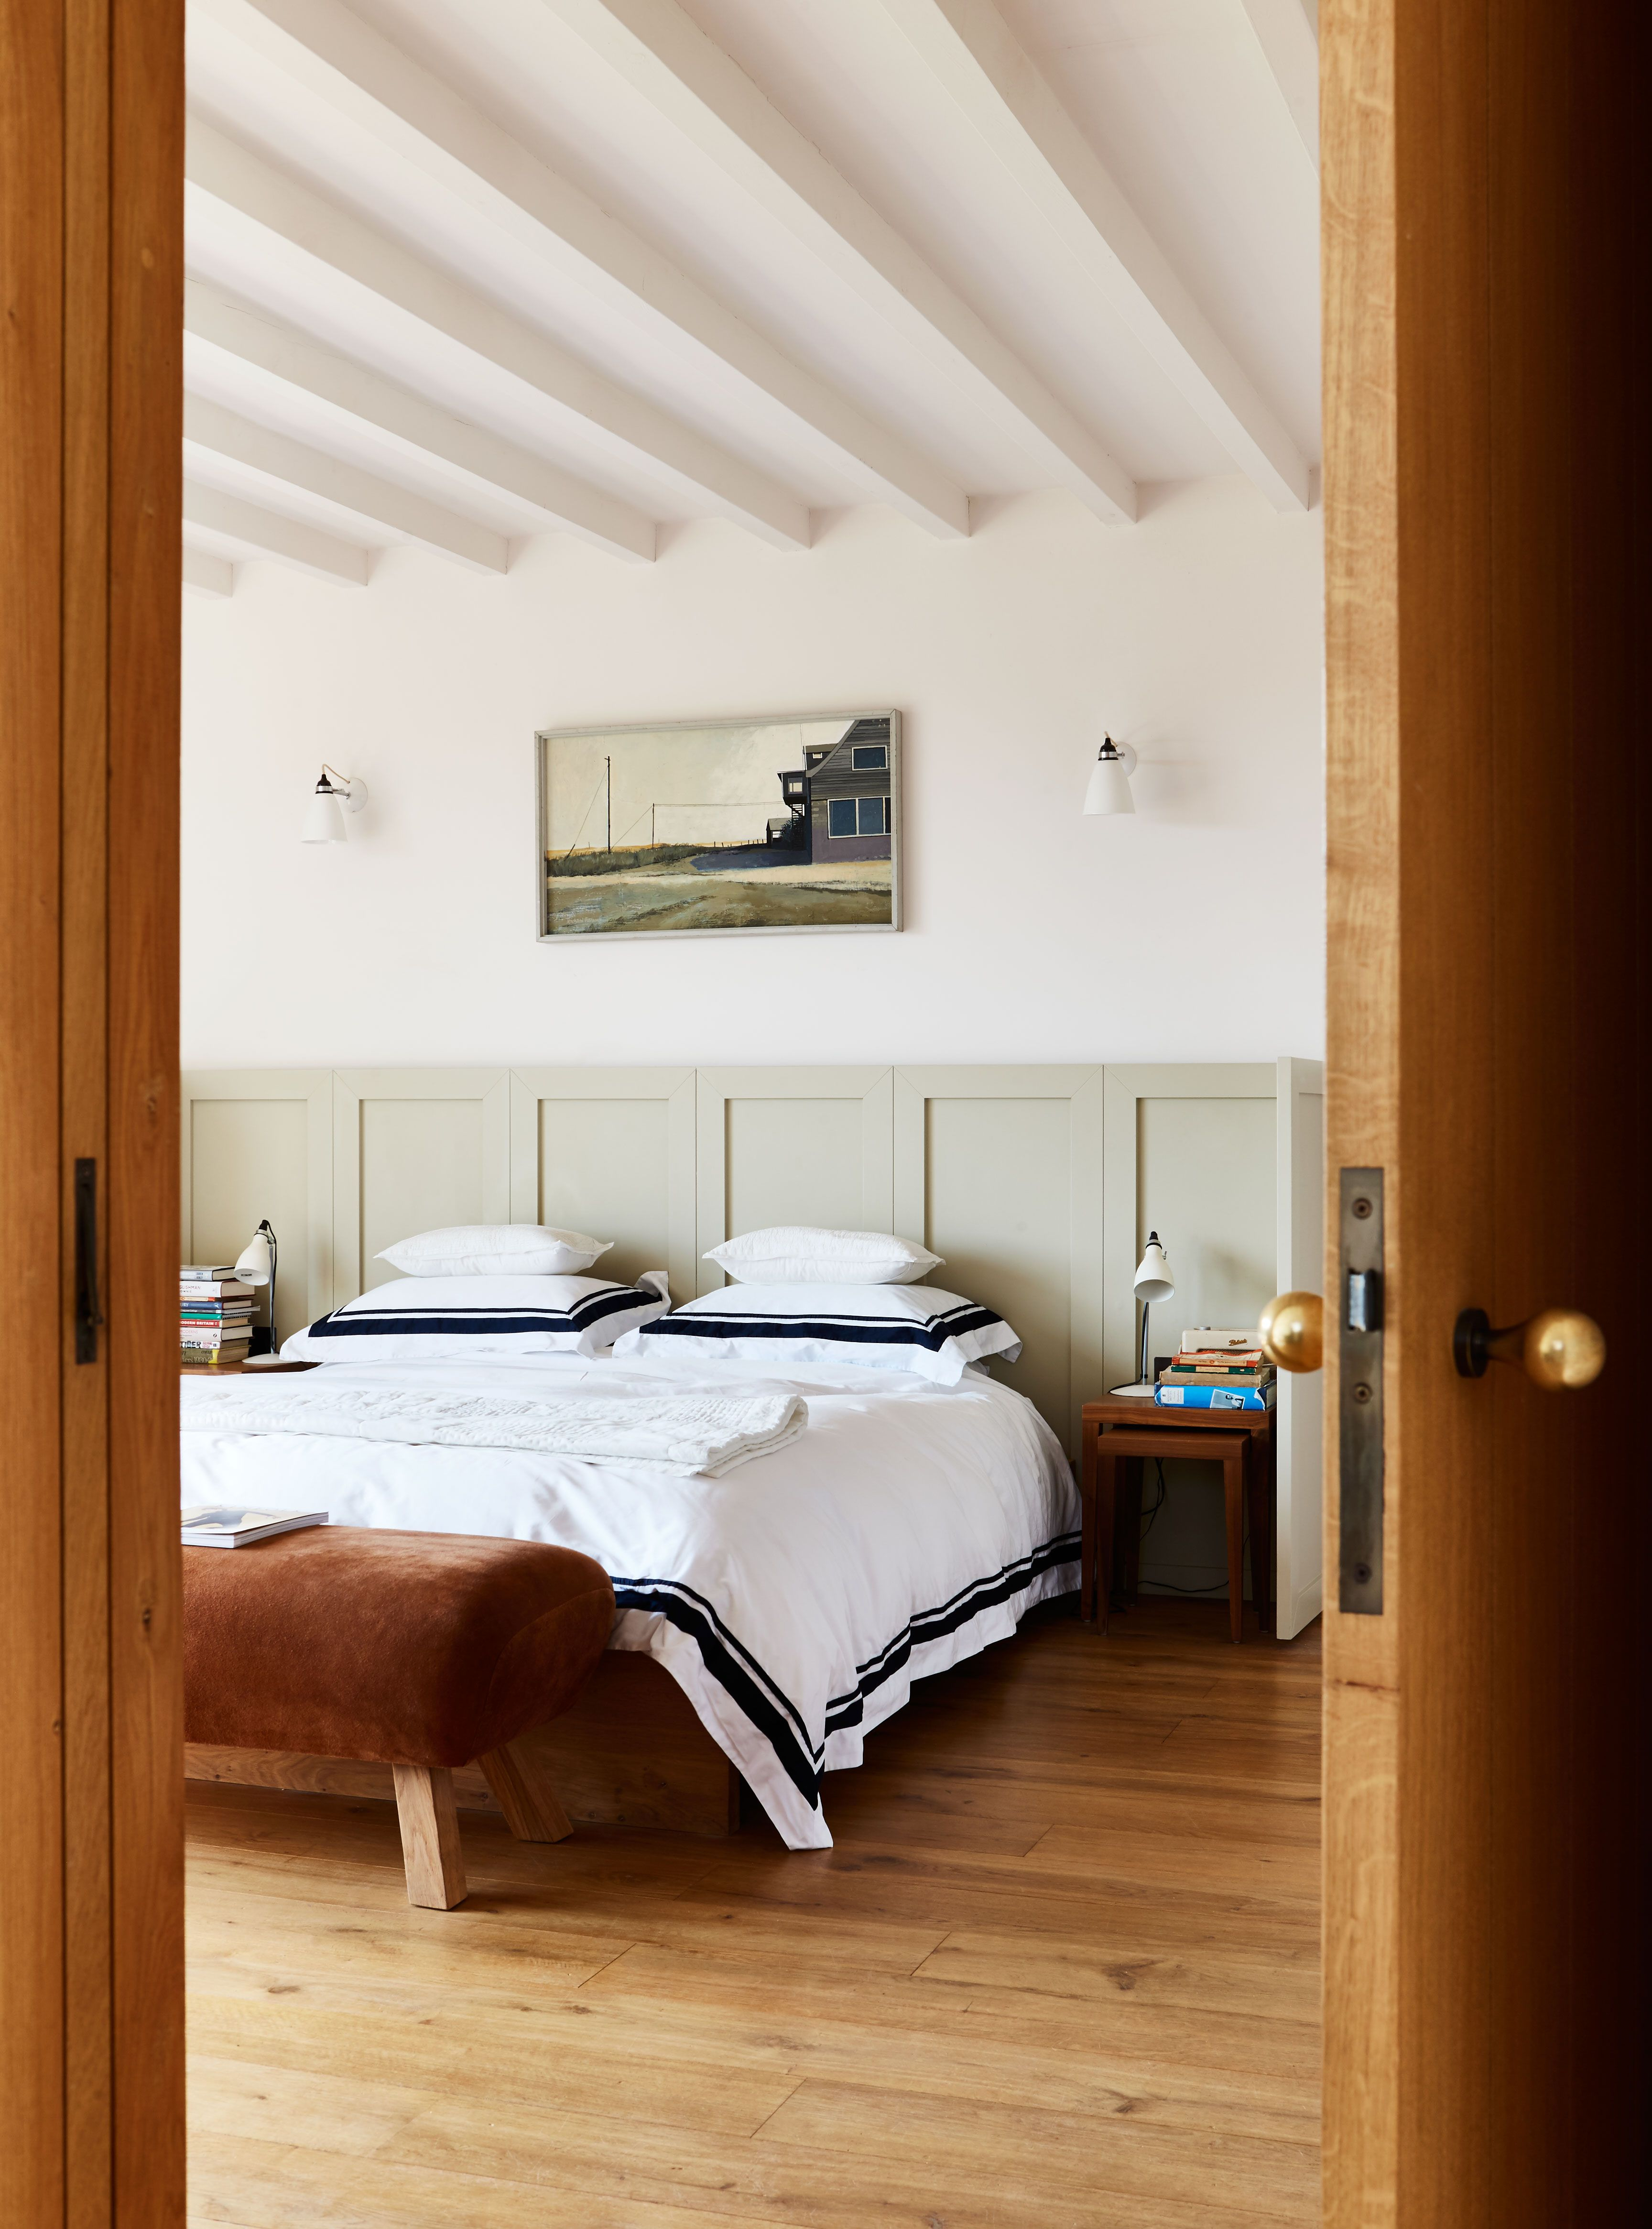 40 beautiful bedroom decorating ideas modern bedroom ideas rh housebeautiful com